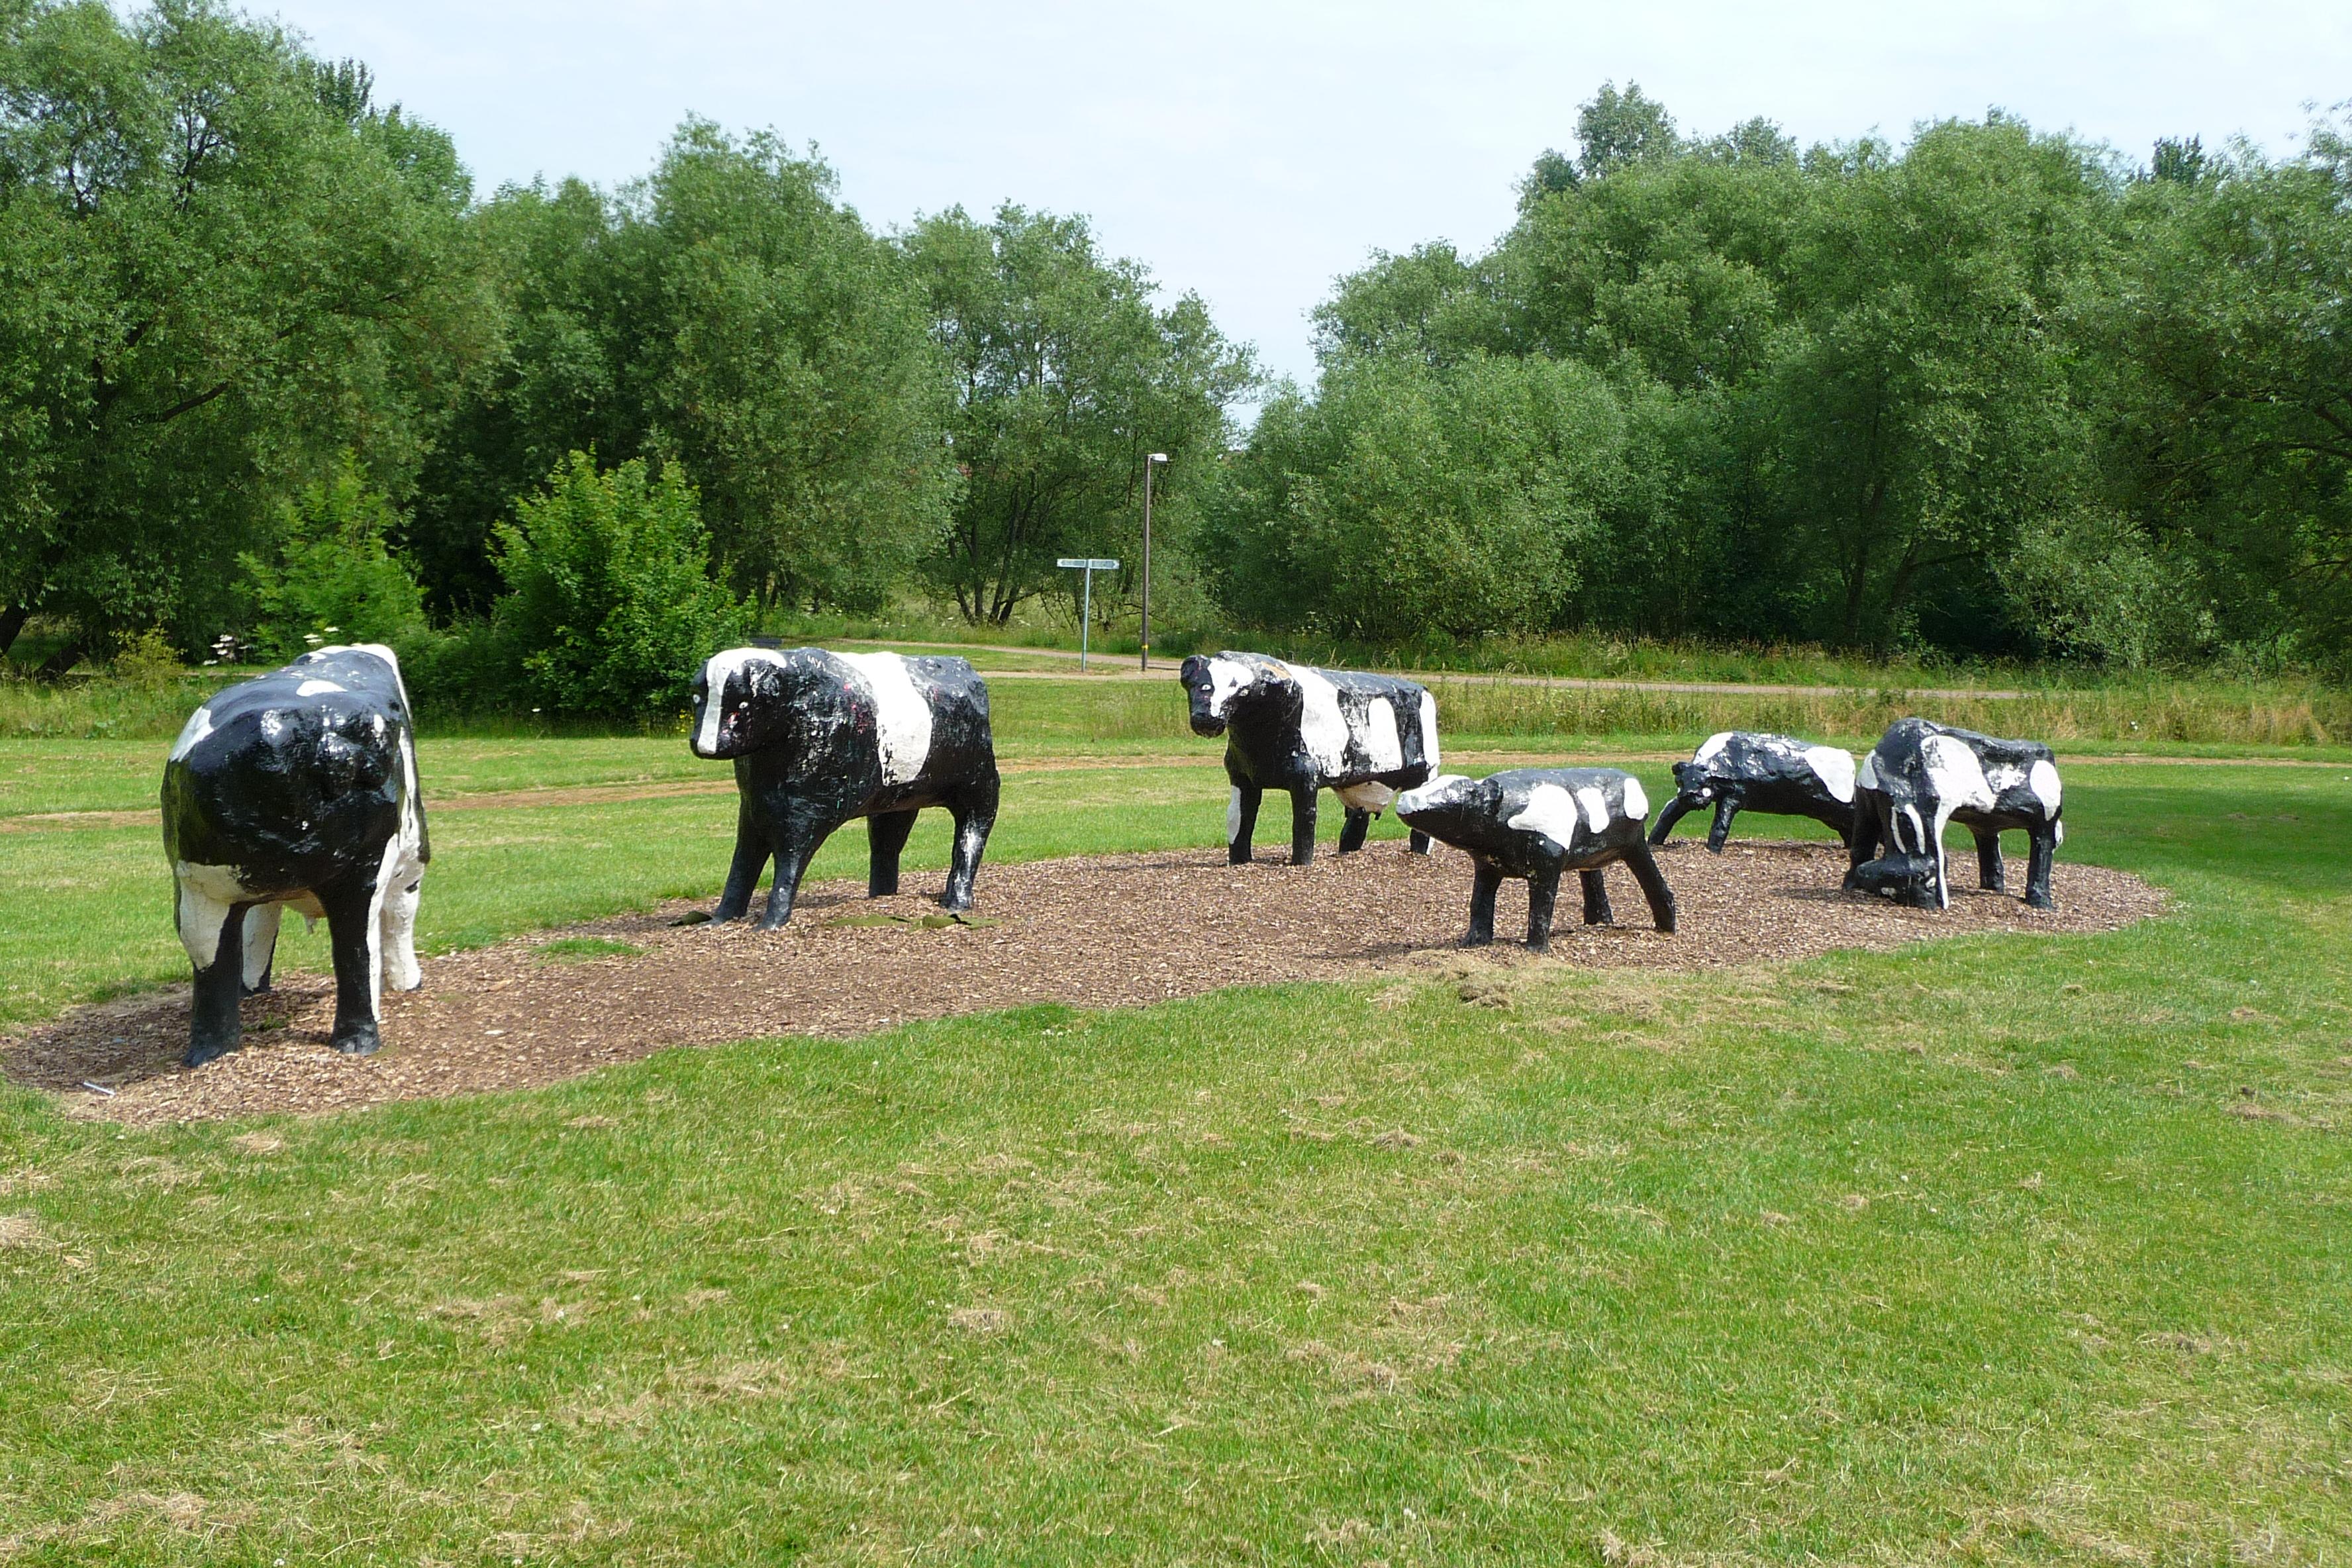 Milton Keynes Concrete Cows 2009 Flickr Photo Sharing